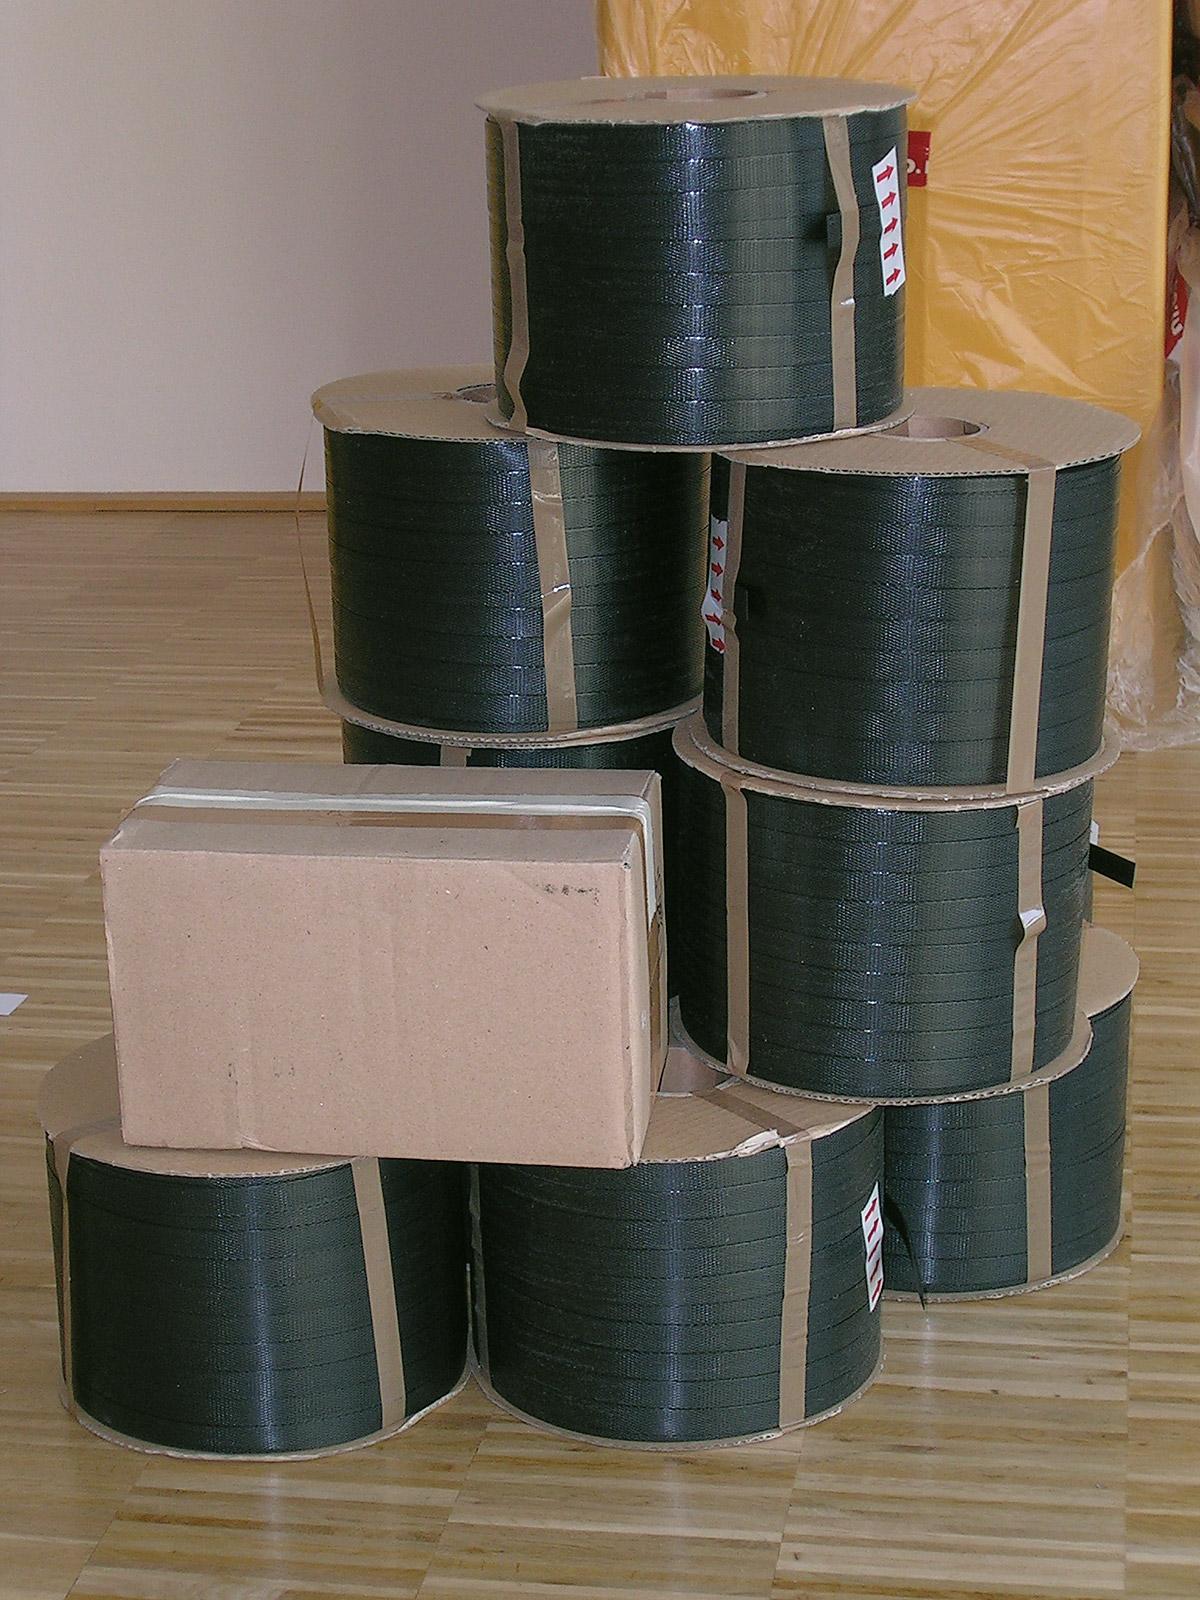 Paketband als Baumaterial